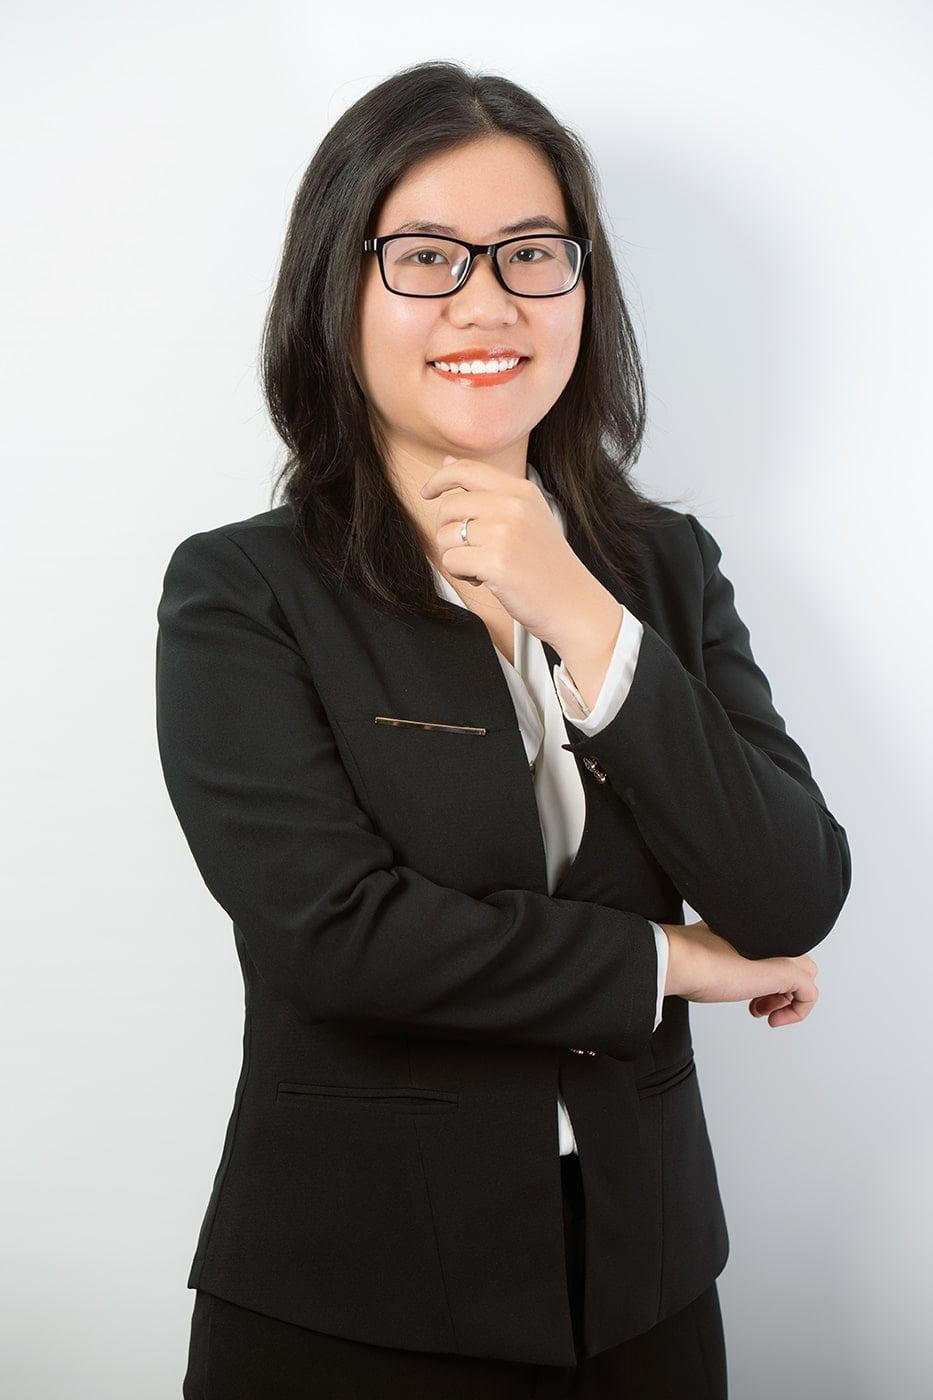 Profile cong ty 12 - Album chụp ảnh profile công ty Luật Dzungsrt Law - HThao Studio